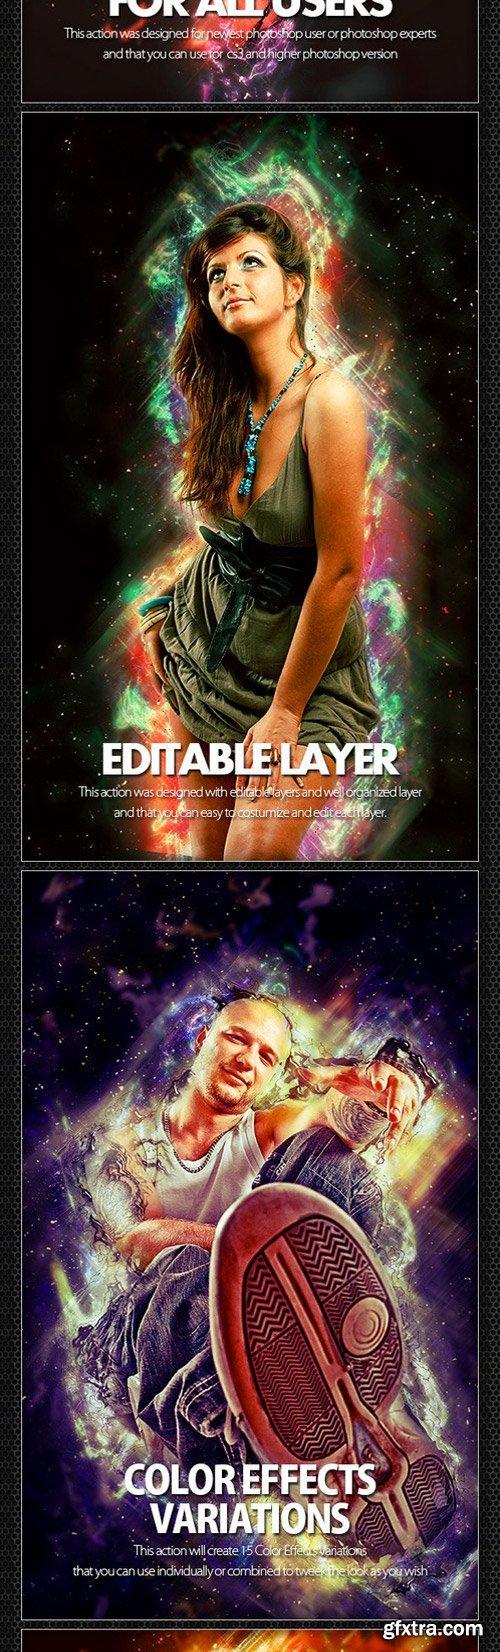 GraphicRiver - 12130663 Galaxians Photoshop Action